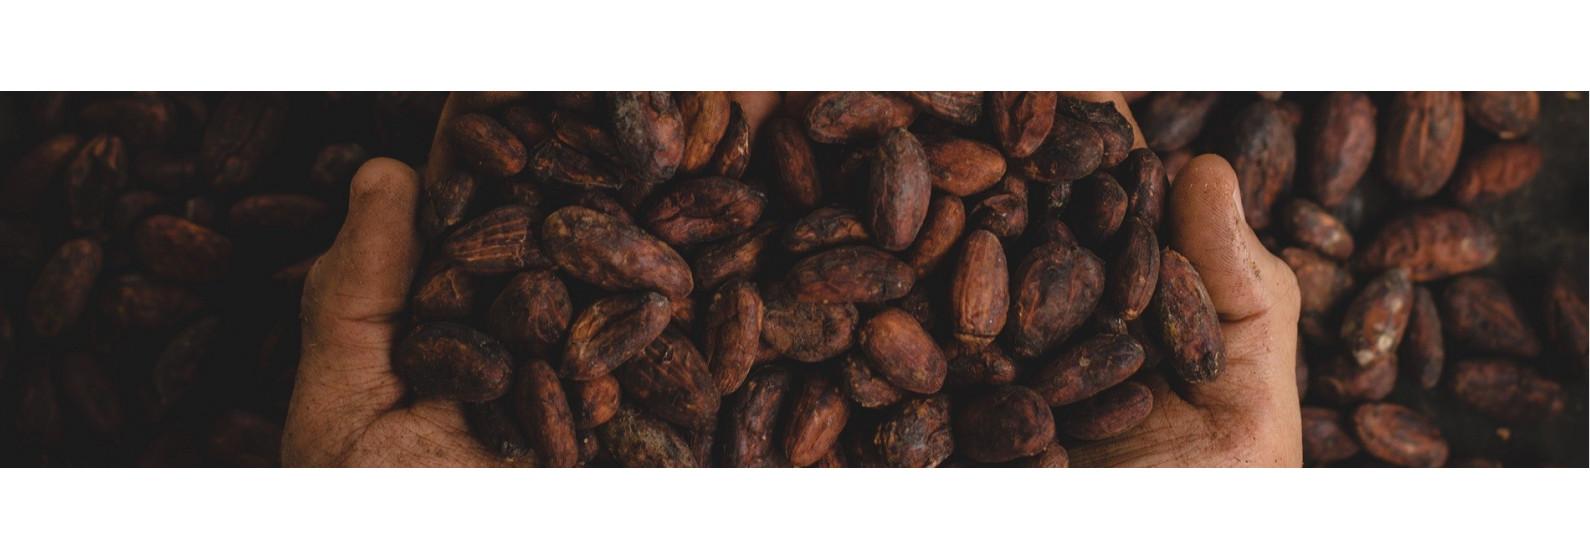 Chocolatées